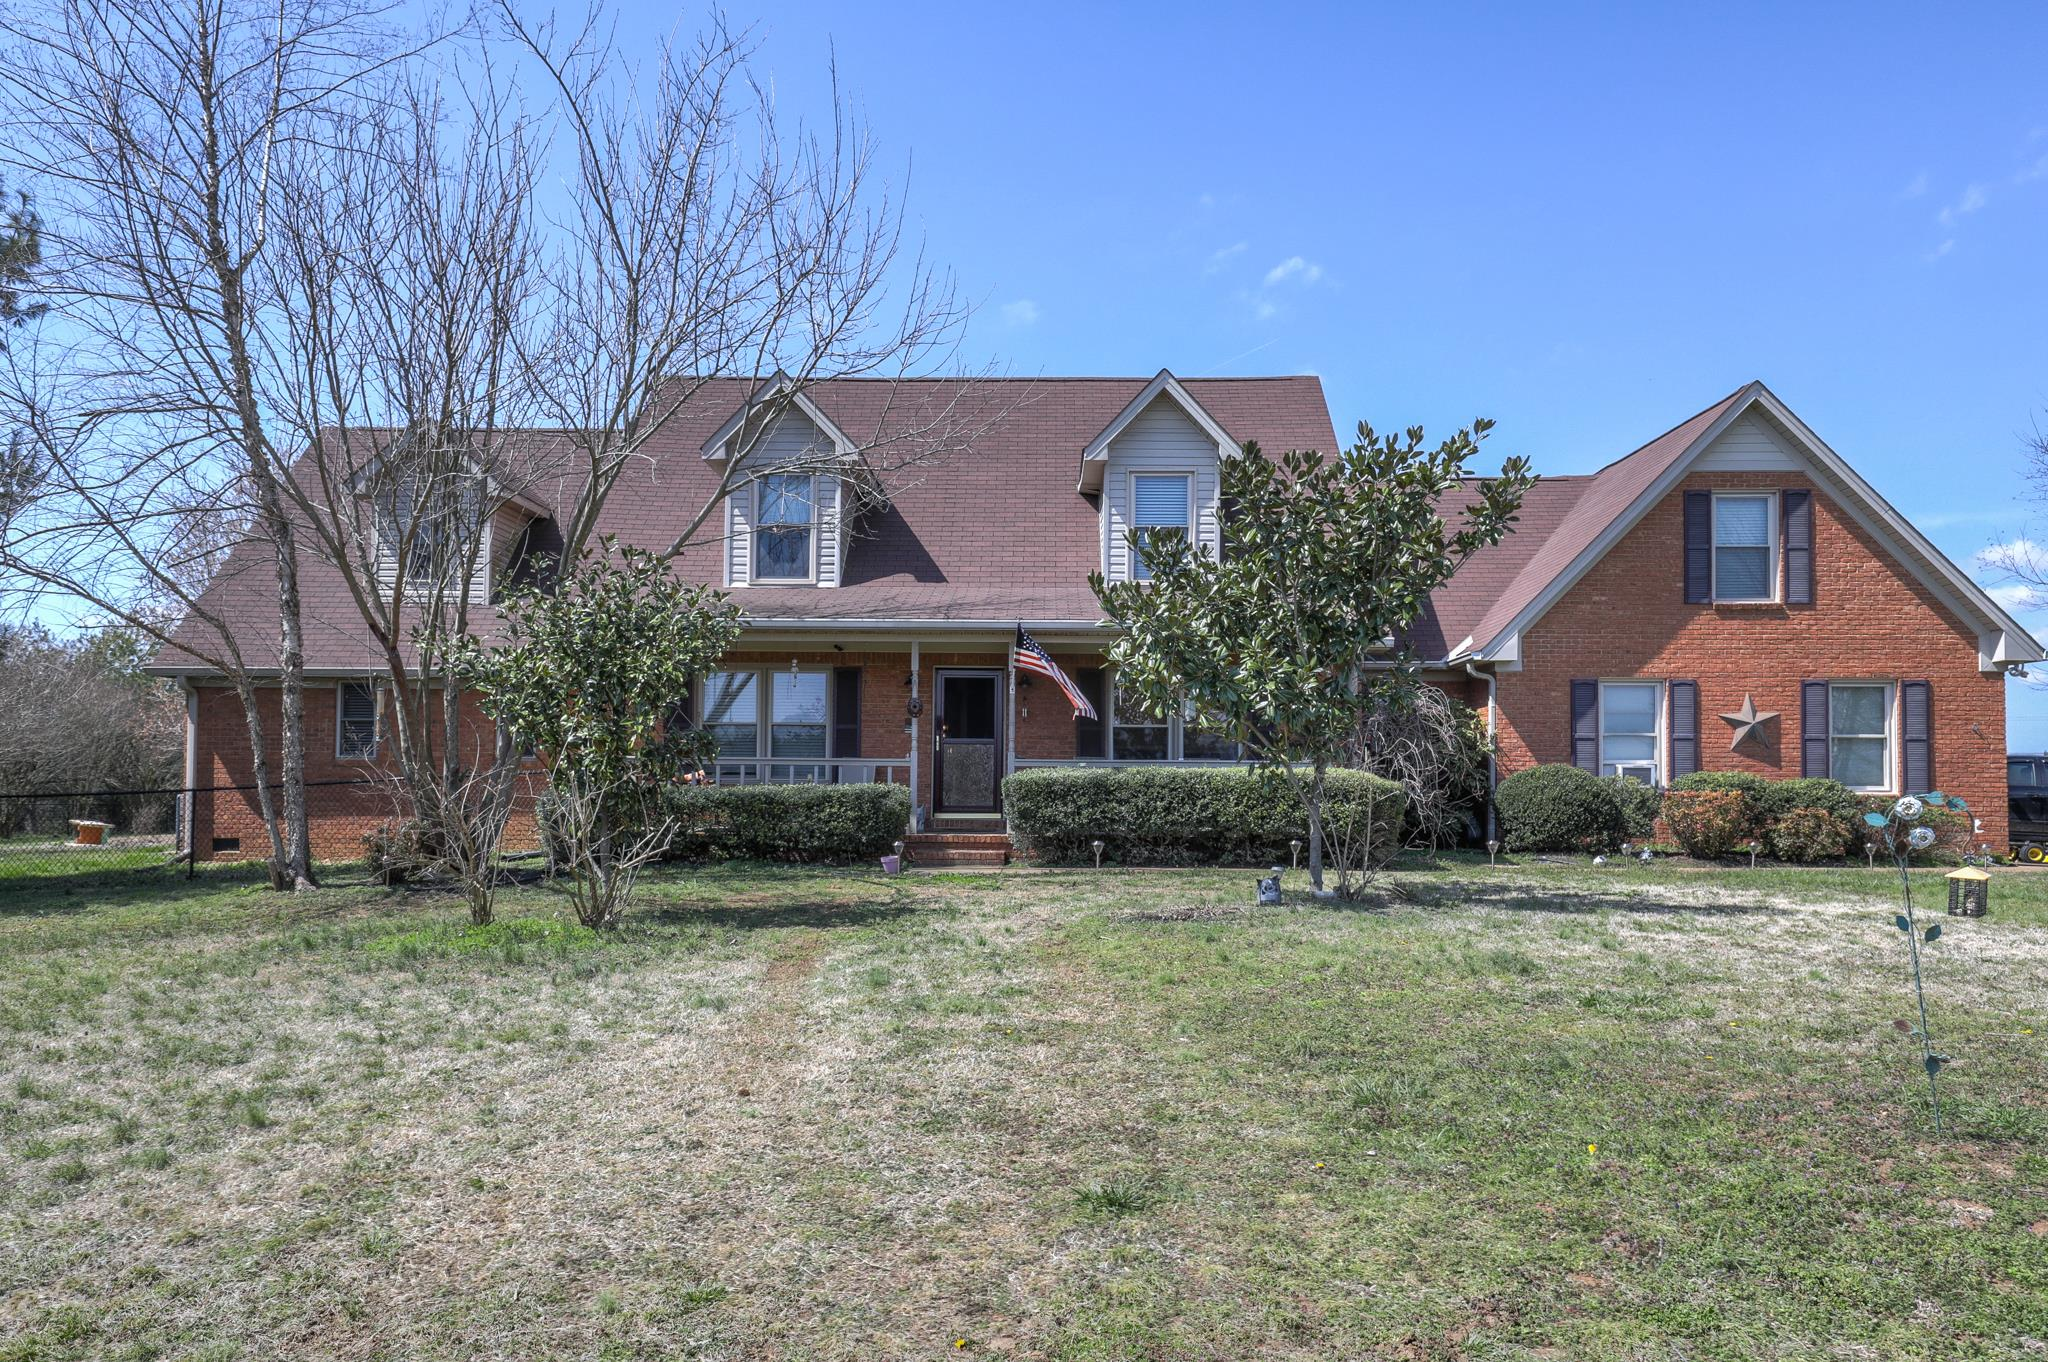 2520 Zion Rd, Columbia, TN 38401